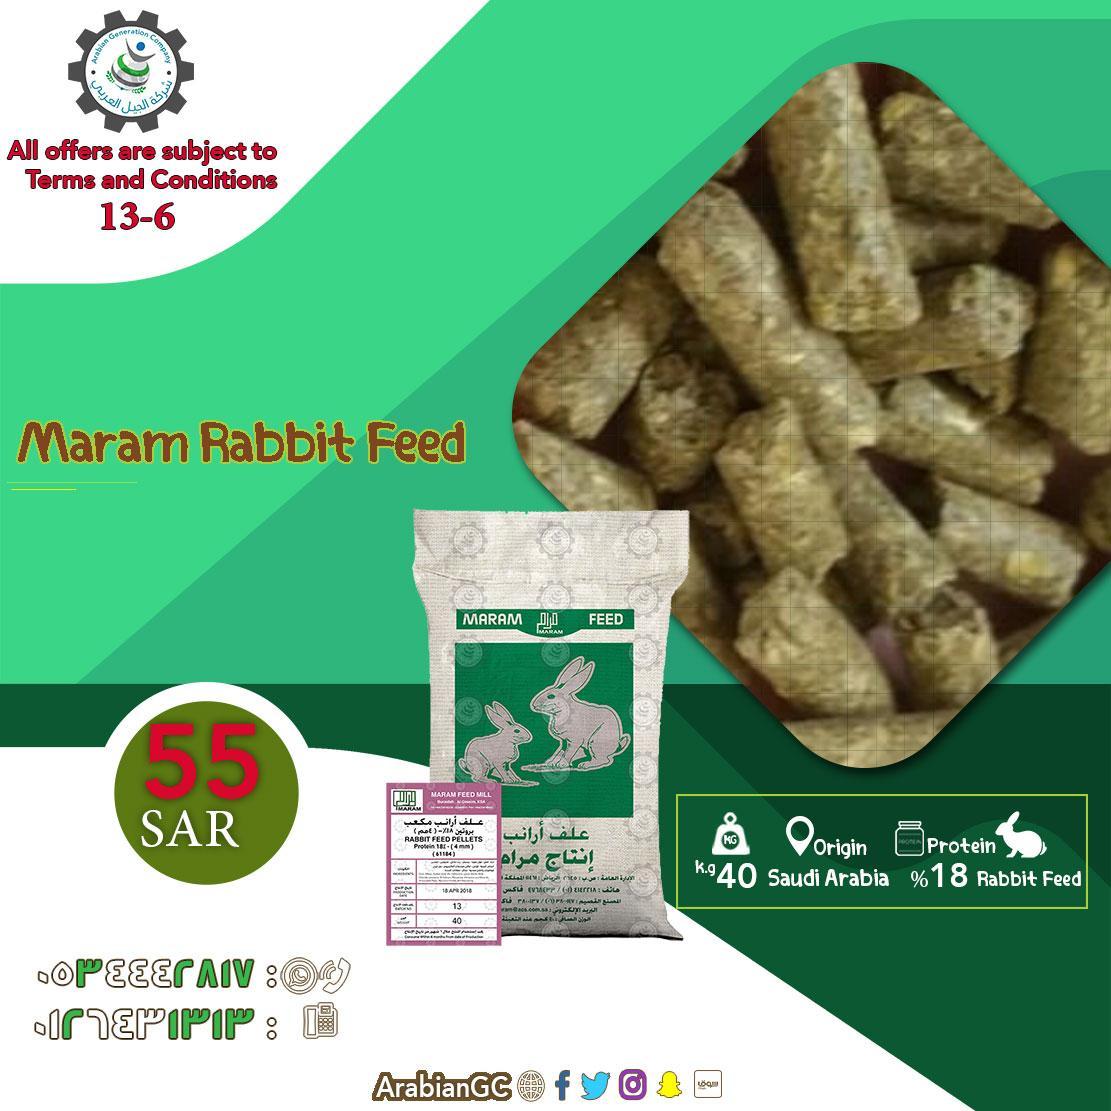 Maram rabbits feed d.php?hash=GR8X17BOR